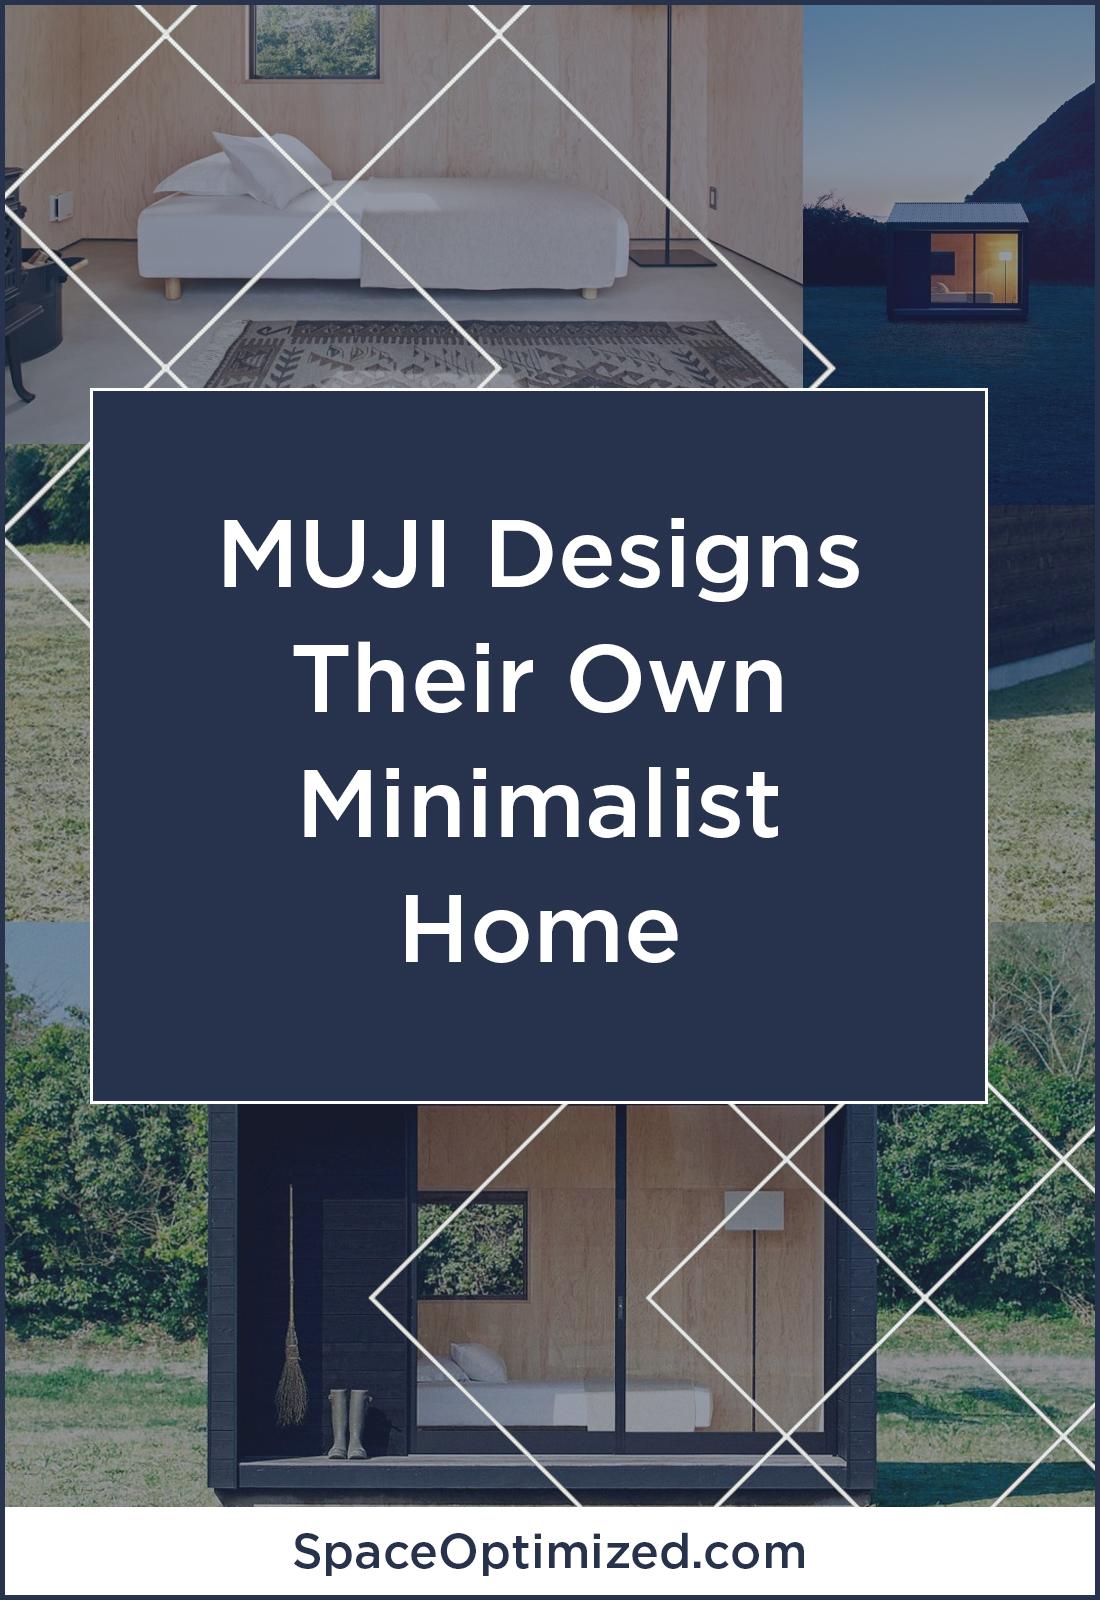 Tiny Home Small Home Minimalist House